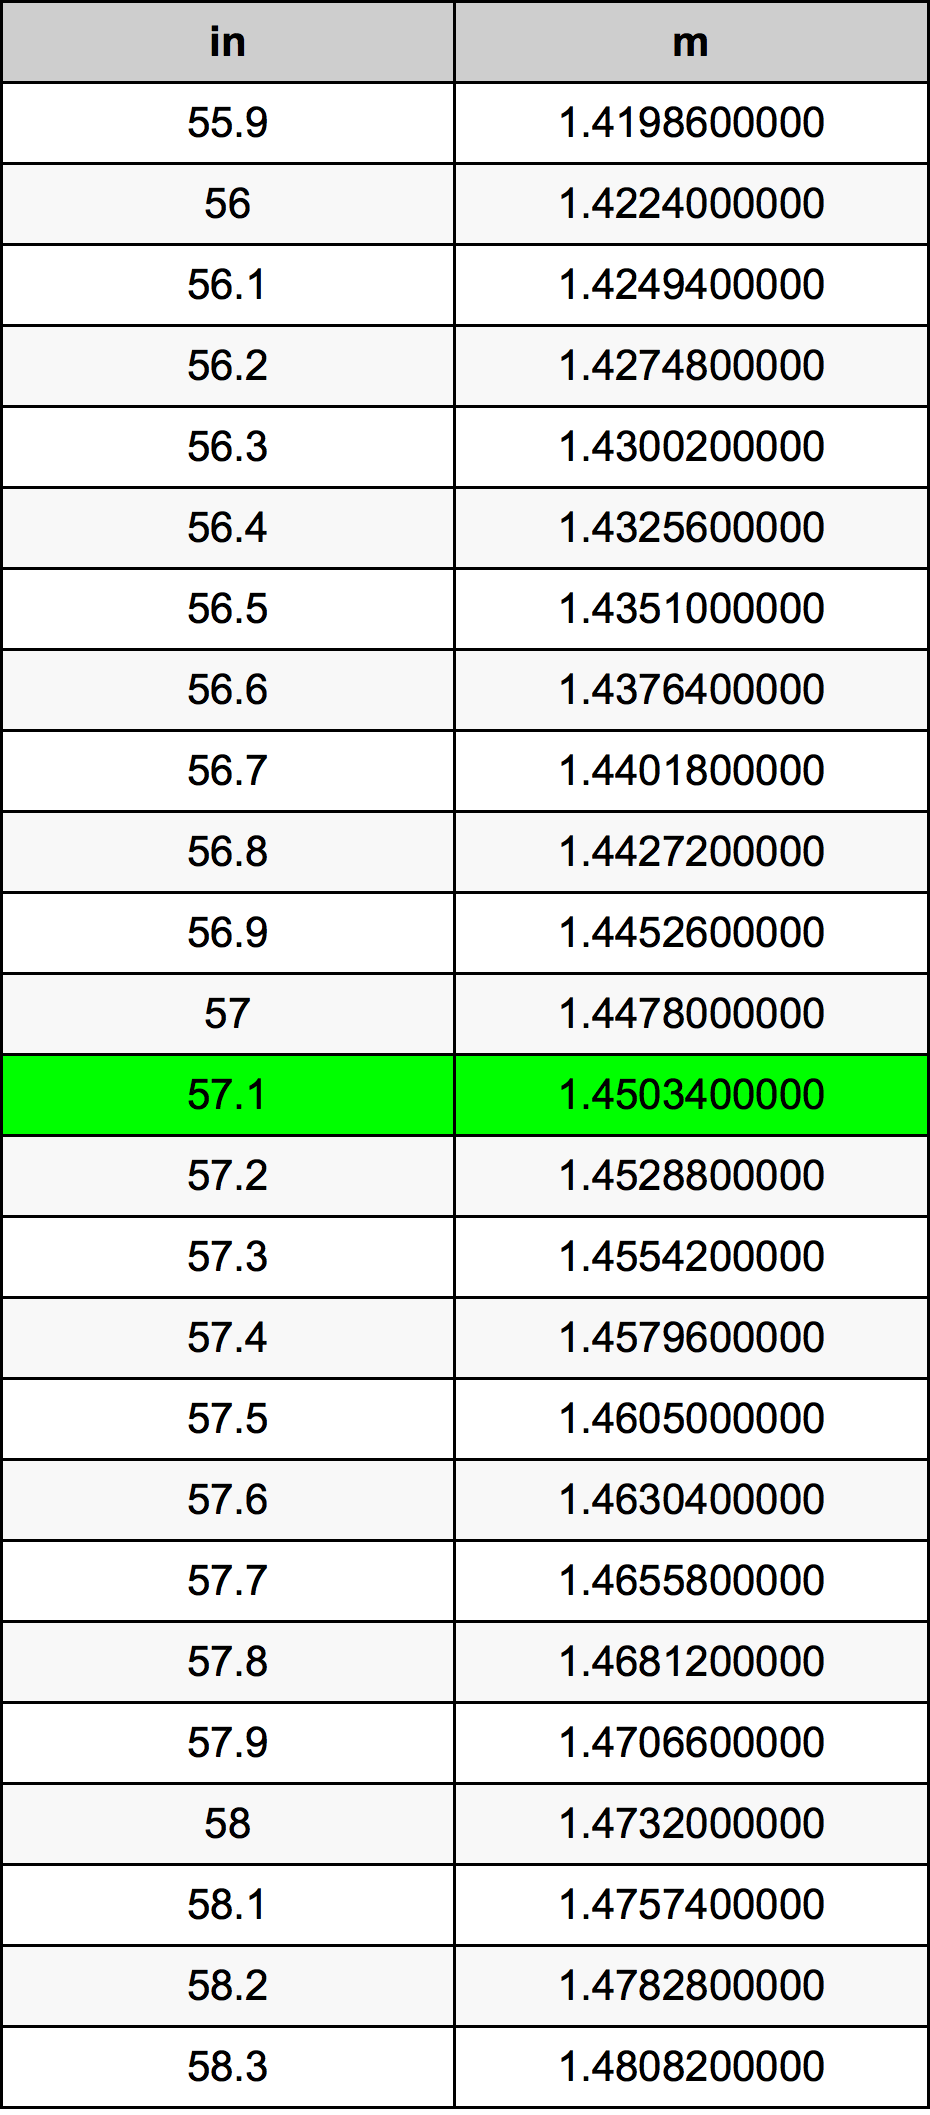 57.1 Inch konverteringstabell